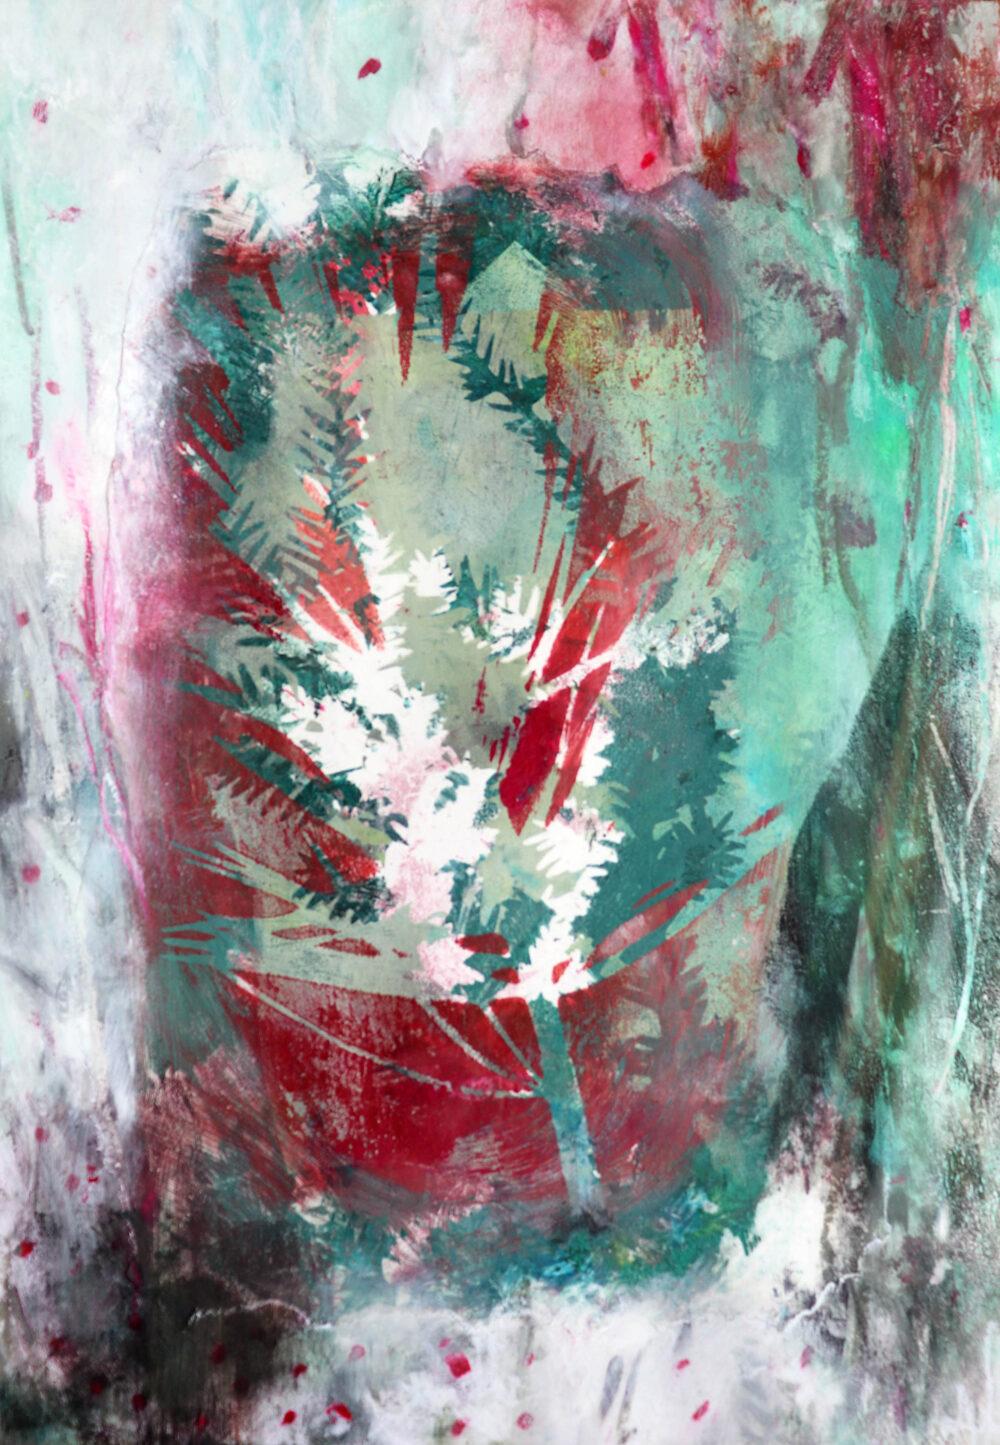 abstrait-botanique-feuille-artiste-peintre-carine-genadry